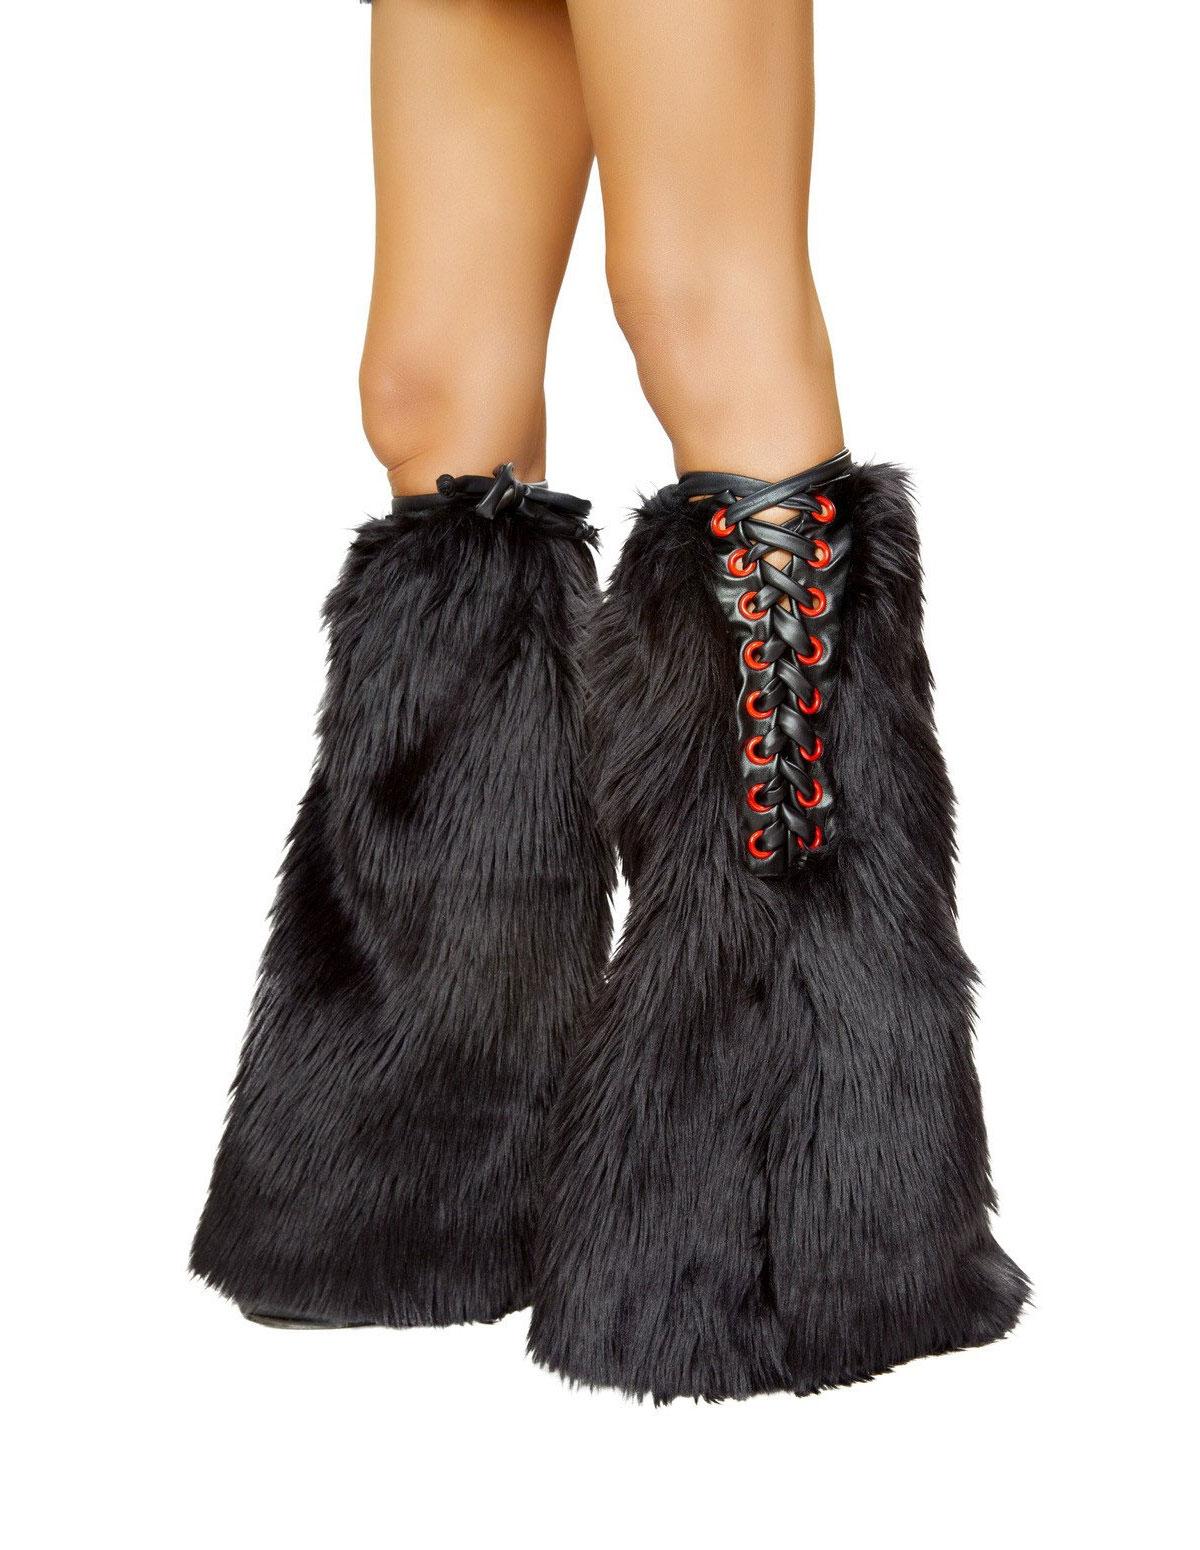 Black Magic Leg Warmers